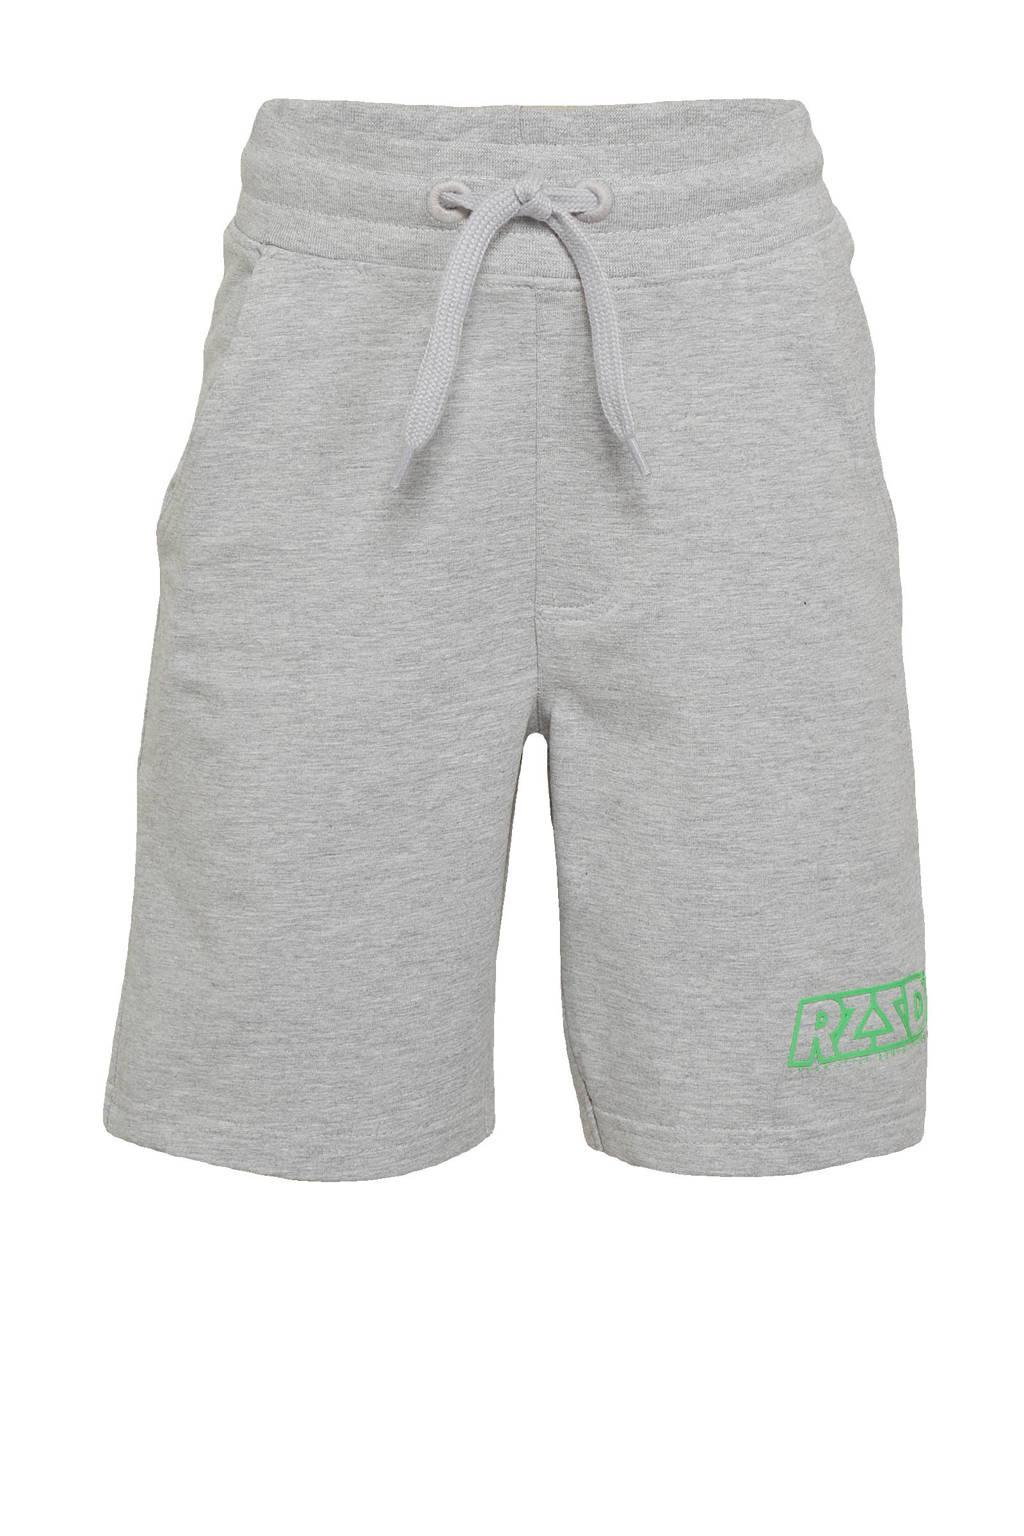 Raizzed regular fit sweatshort Rome lichtgrijs melange, Lichtgrijs melange